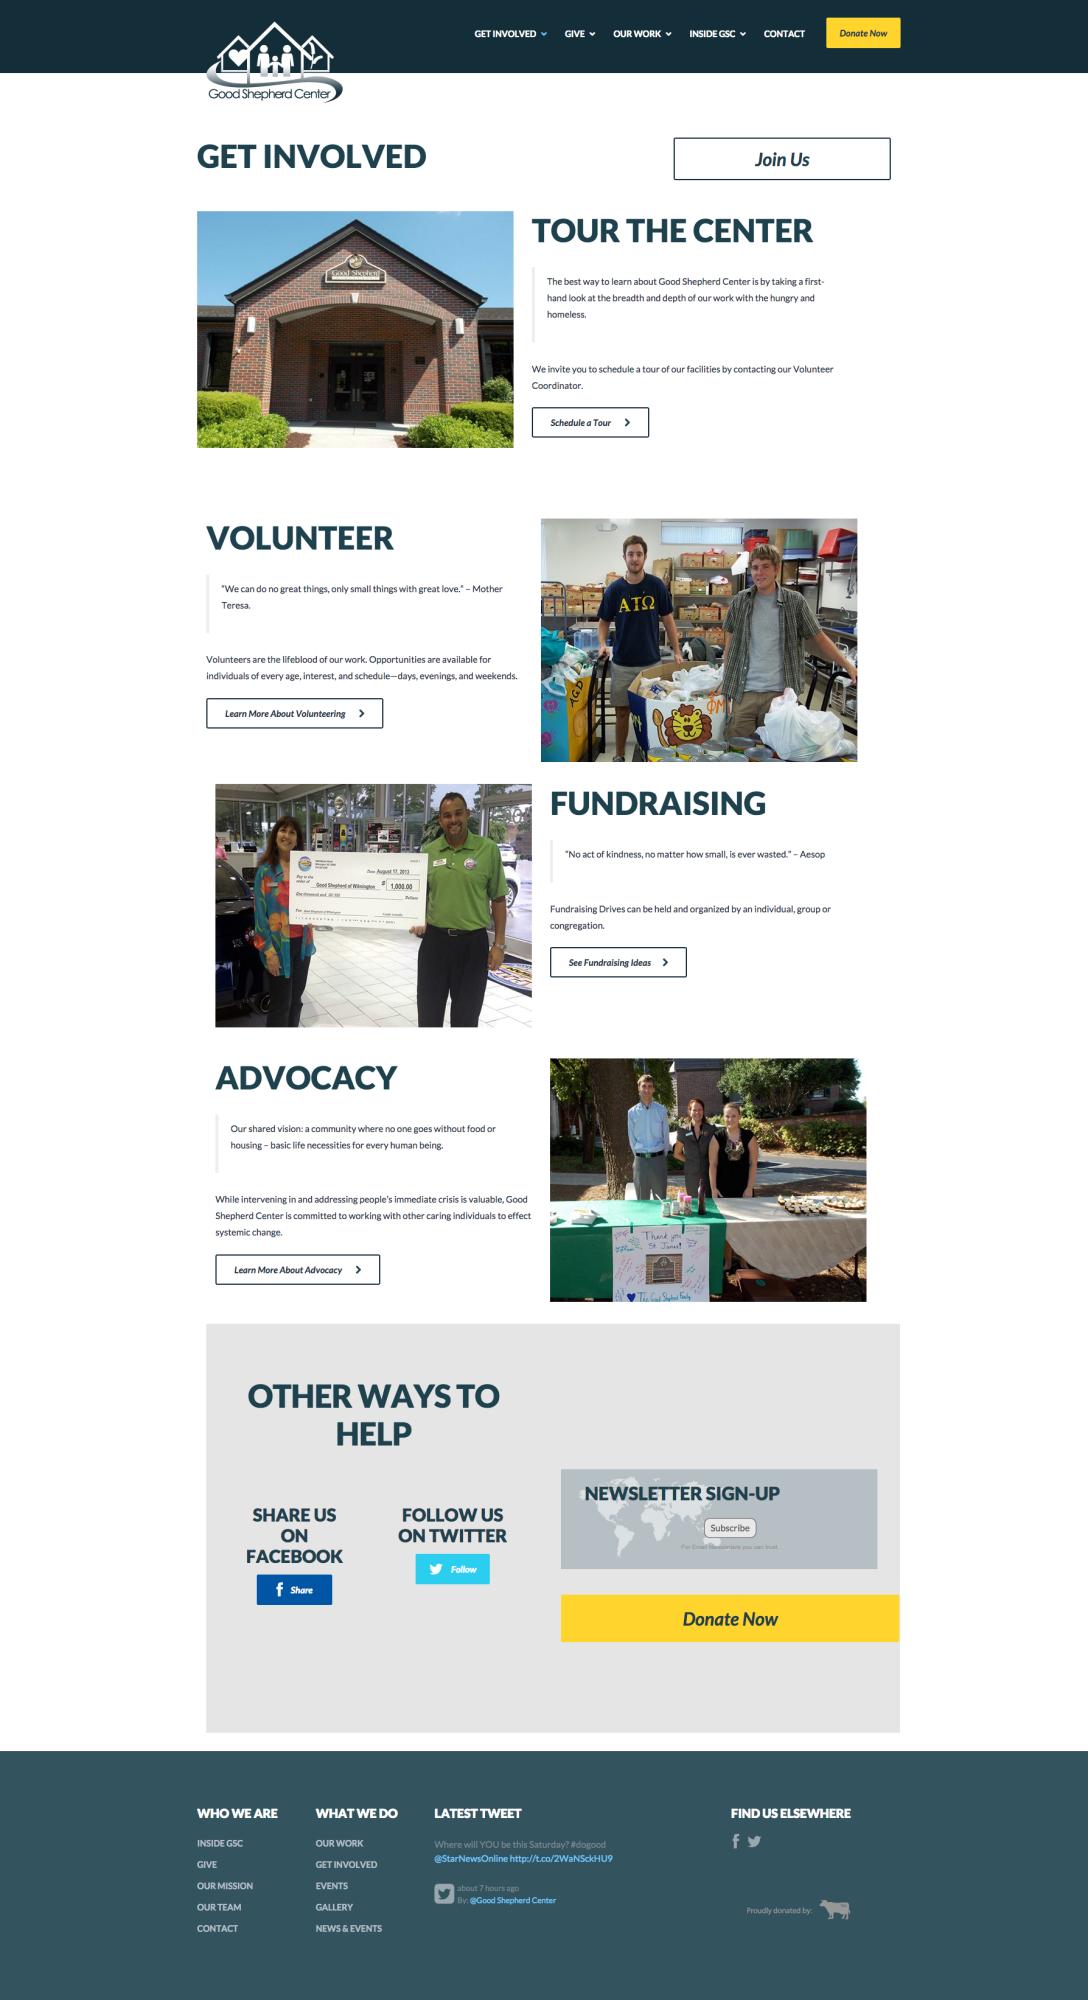 screencapture-goodshepherdwilmington-org-get-involved